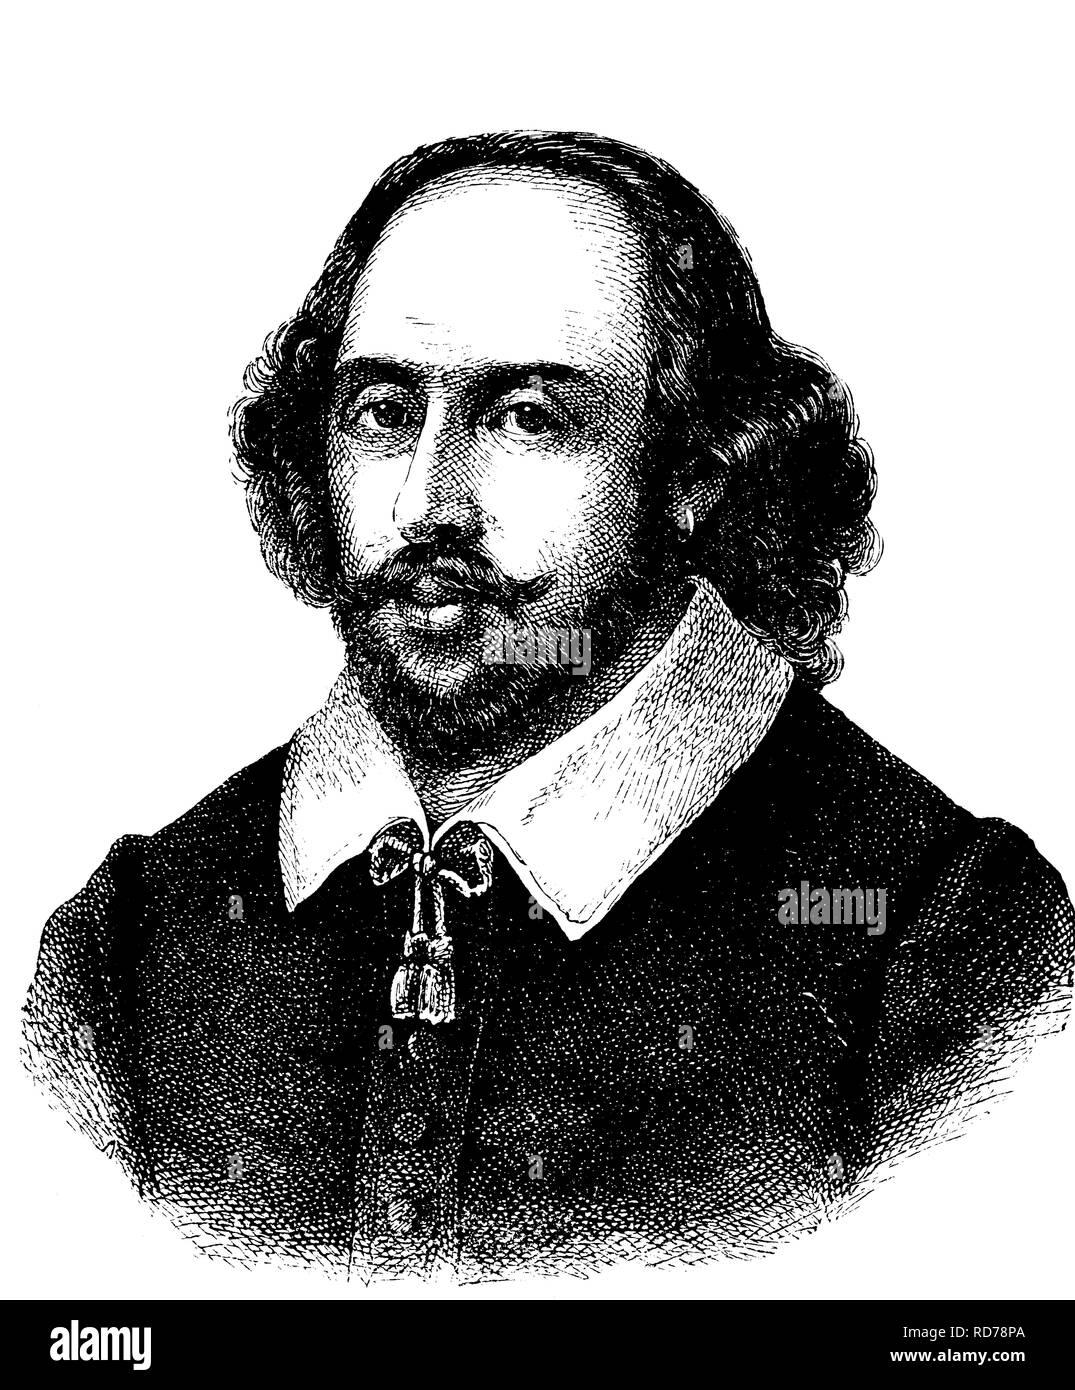 William Shakespeare, 1564 - 1616, English dramatist and poet, historical woodcut, 1880 Stock Photo